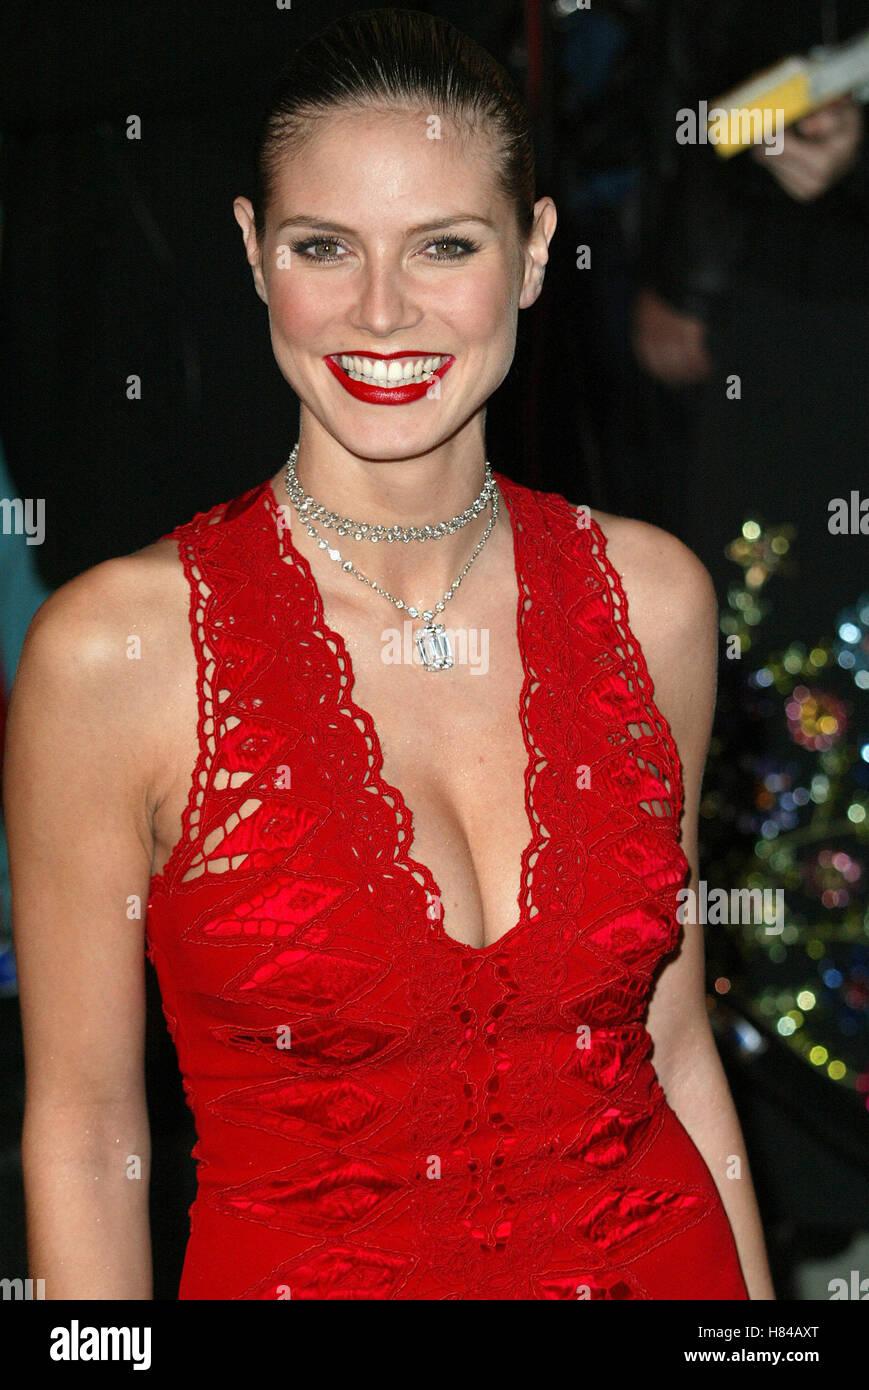 Heidi Klum 2002